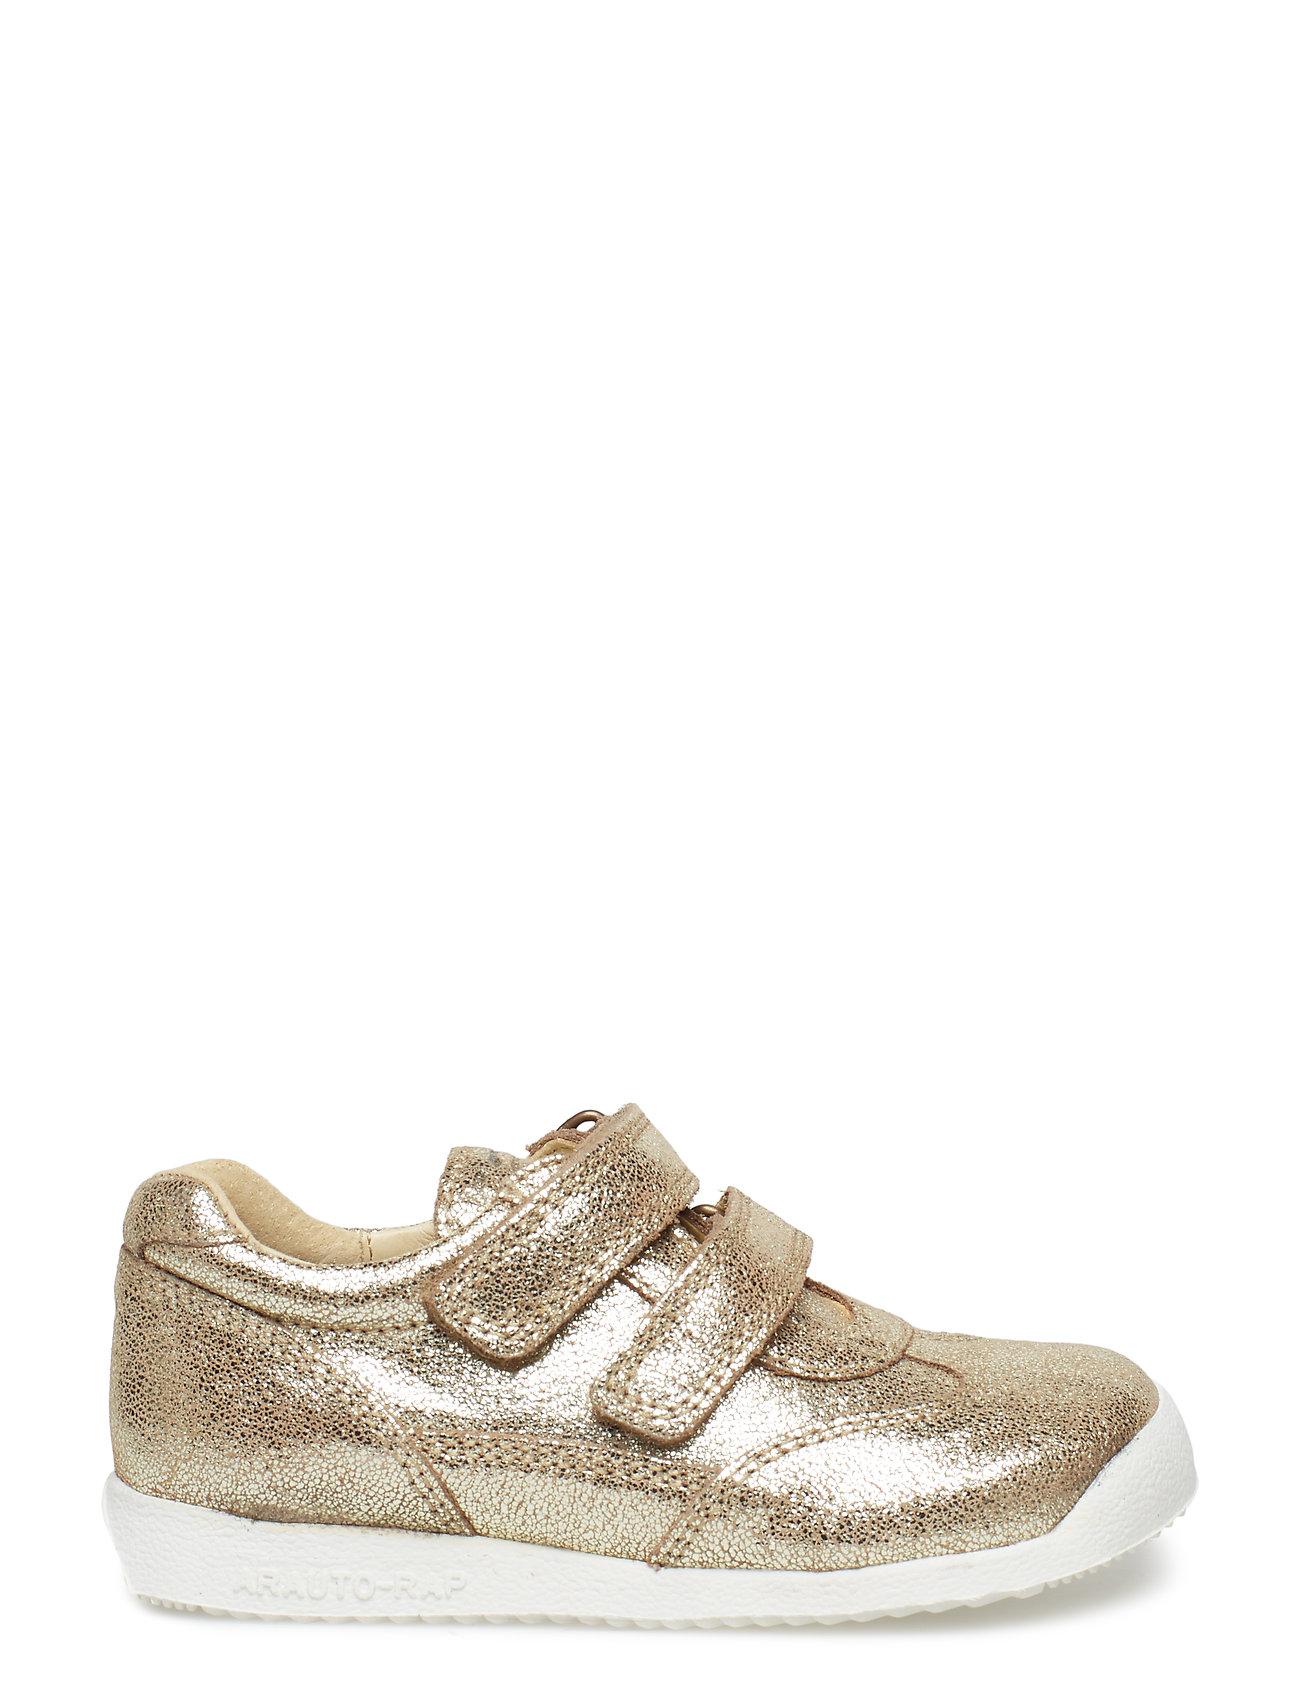 4979b413a8ad Arauto RAP sneakers – Hand Made Sneaker til børn i E1-NOB NAVY ...